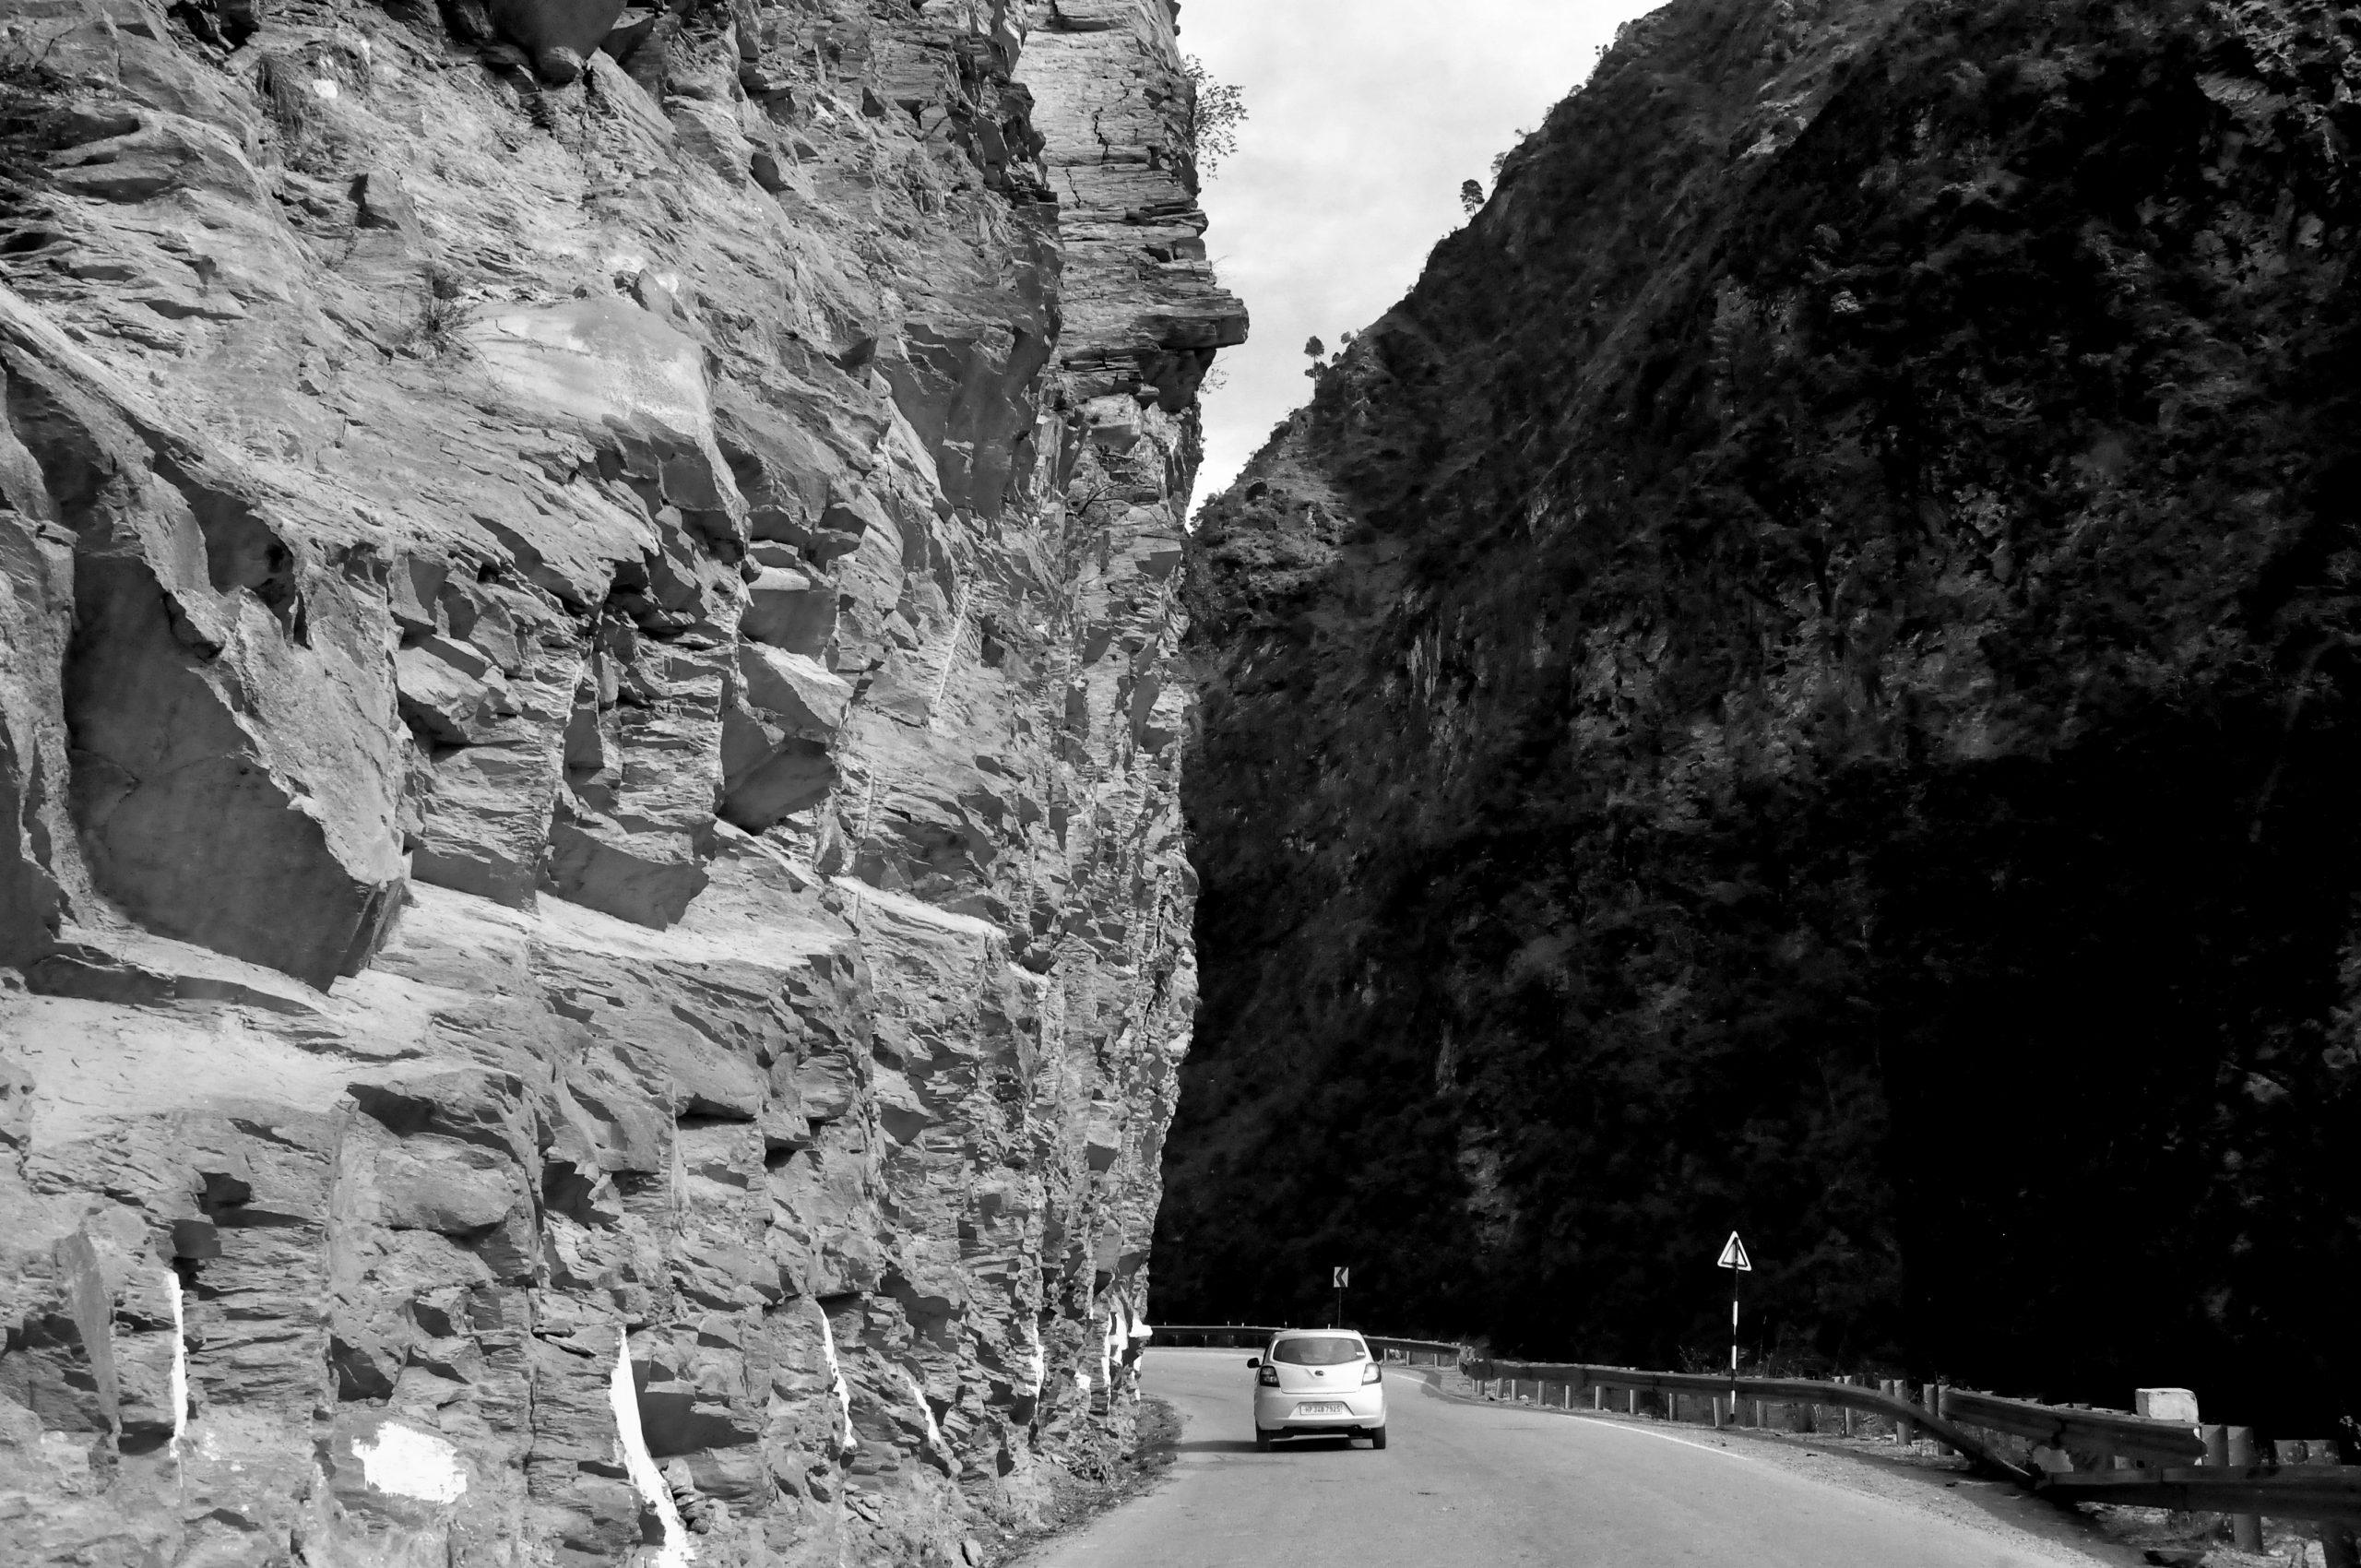 Narrow road to Manali